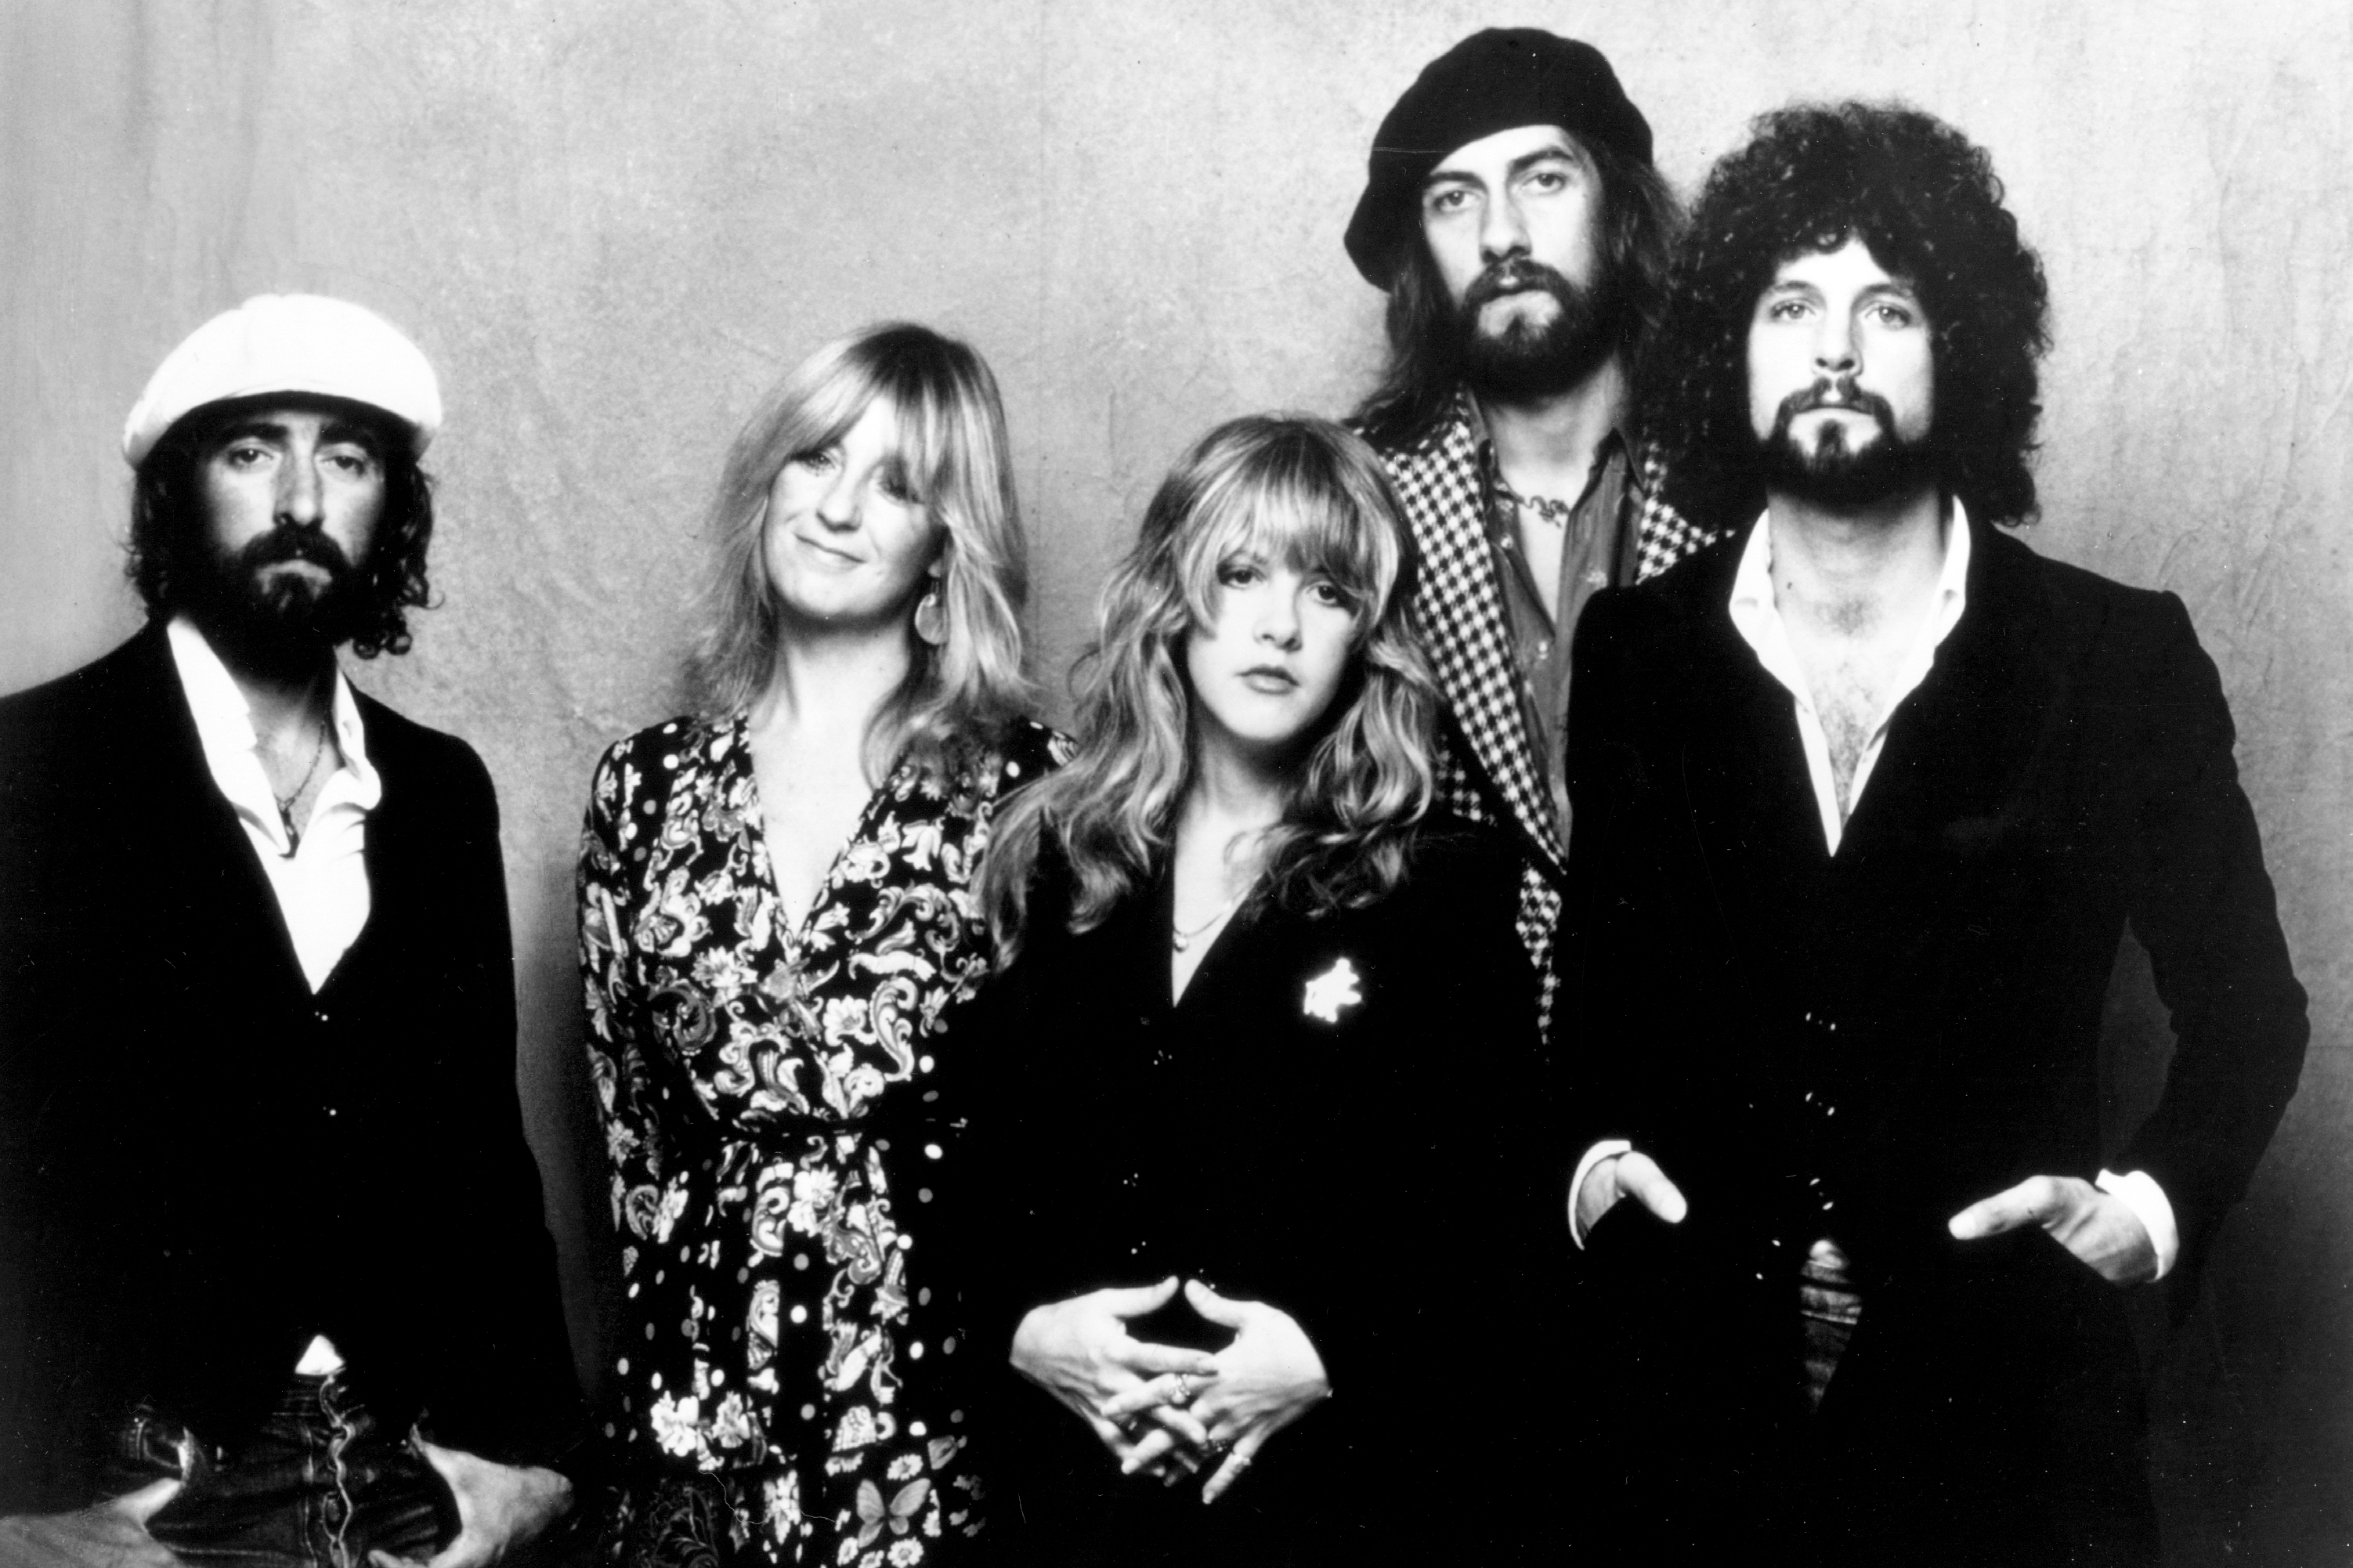 Lindsey Buckingham Sues Fleetwood Mac Over Dismissal From Band ...